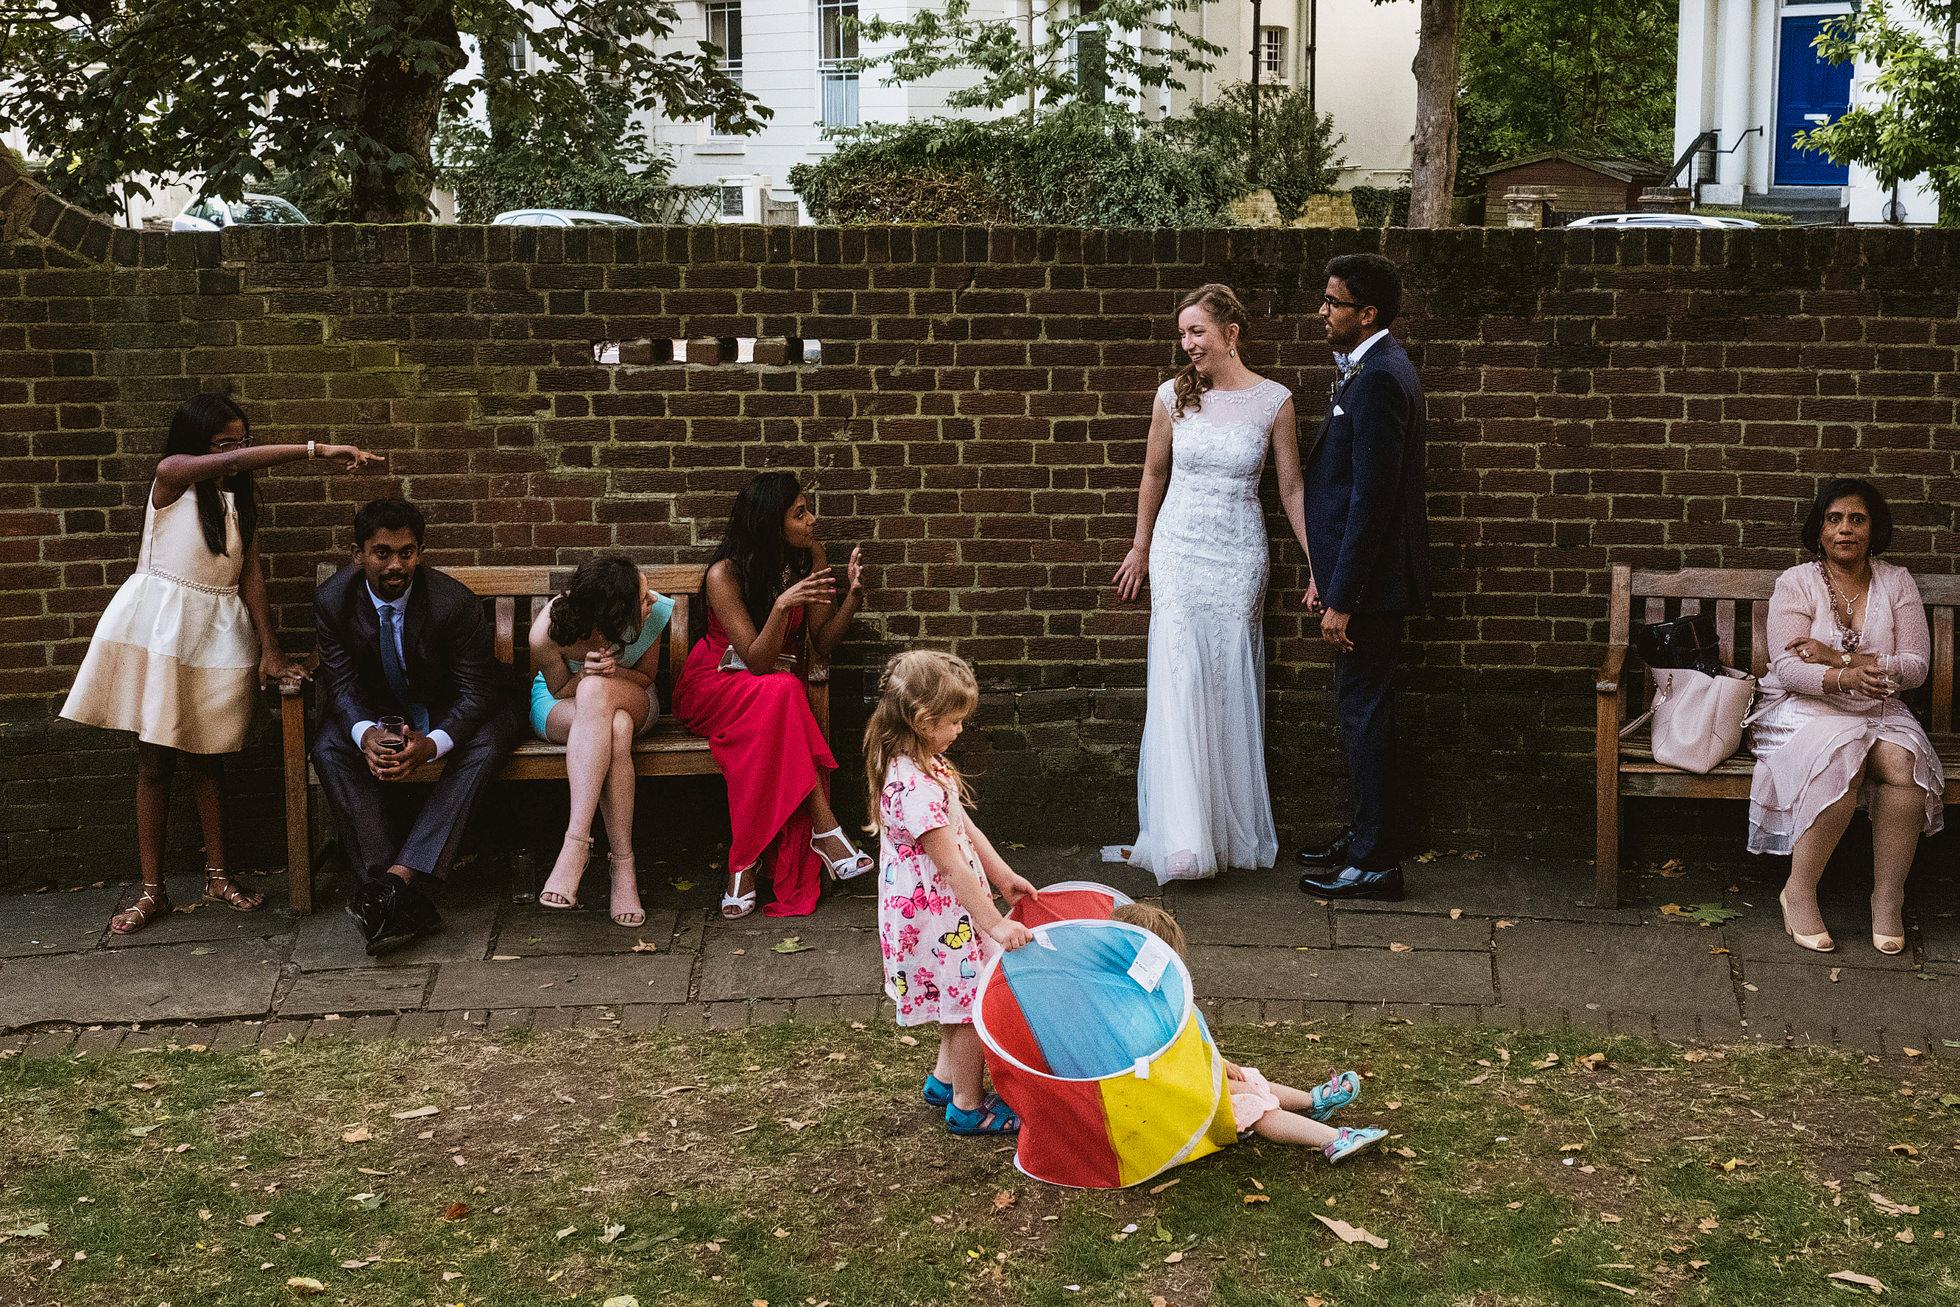 Reportage Wedding Photographer